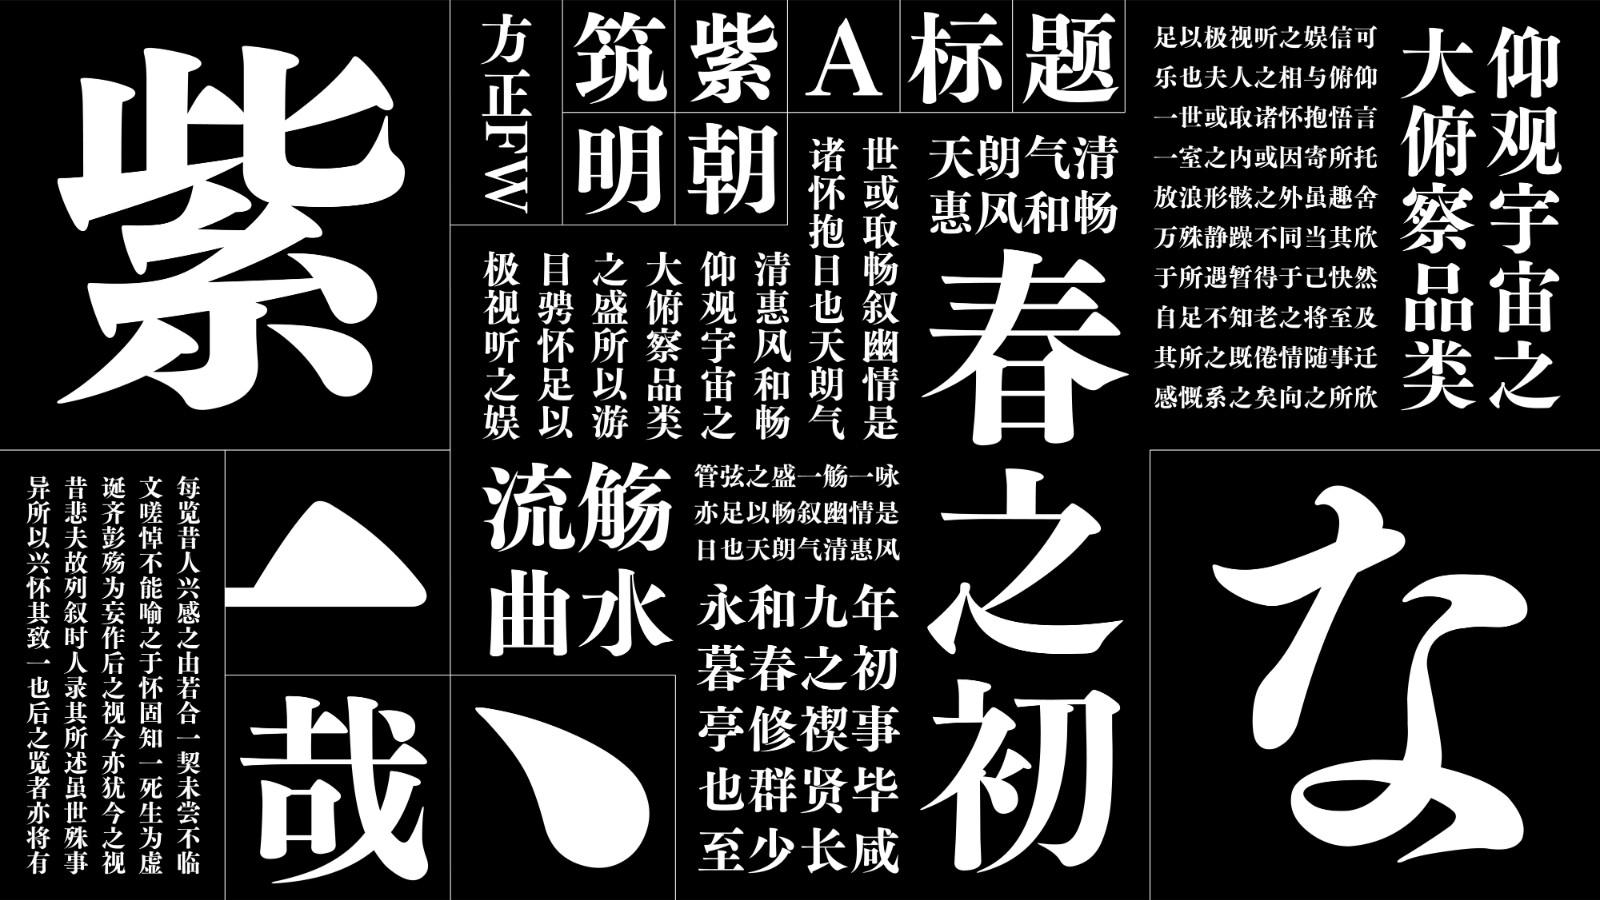 https://ft-bk1.oss-cn-zhangjiakou.aliyuncs.com/Public/Uploads/img/n_content_20201210175728_7064.jpg